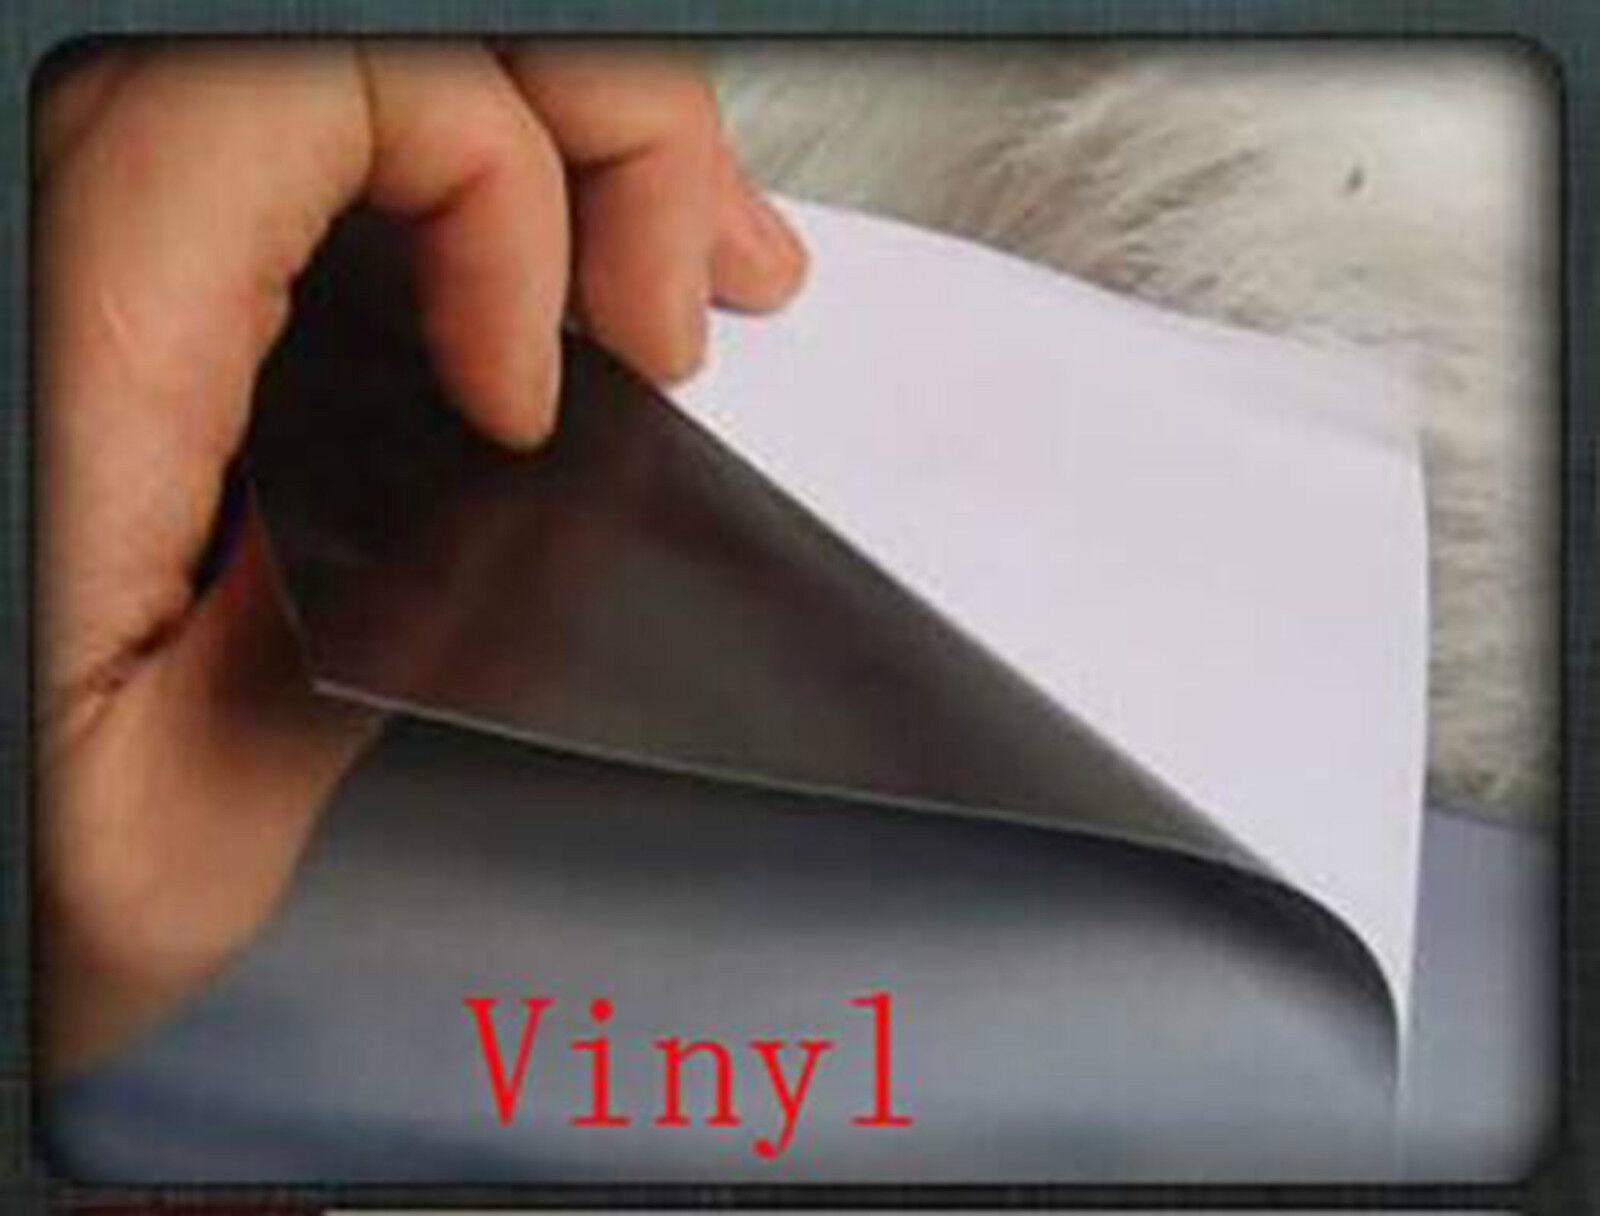 3D 3D 3D Der Bogen 724 Tür Wandmalerei Wandaufkleber Aufkleber AJ WALLPAPER DE Kyra  | New Style  | In hohem Grade geschätzt und weit vertrautes herein und heraus  | Mittlere Kosten  8e1d5e